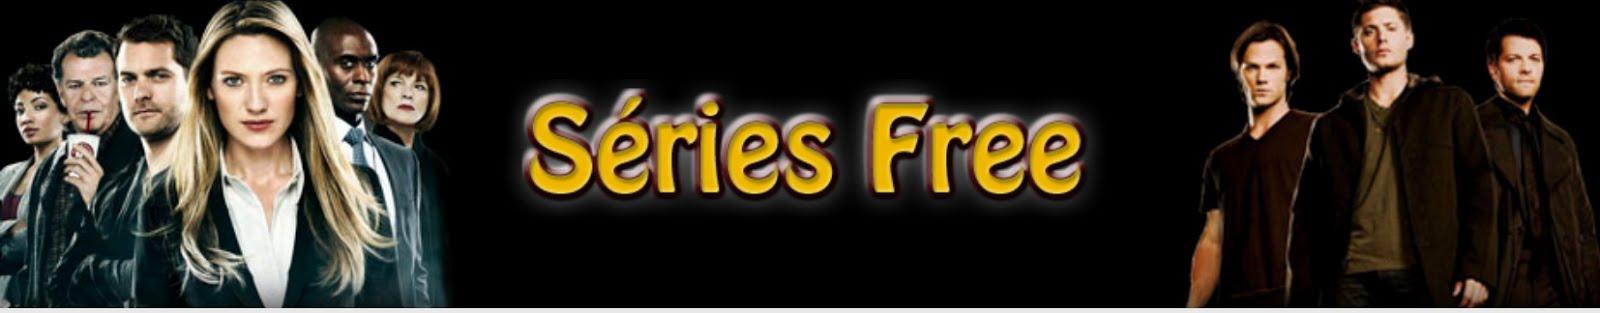 Visite Séries Free